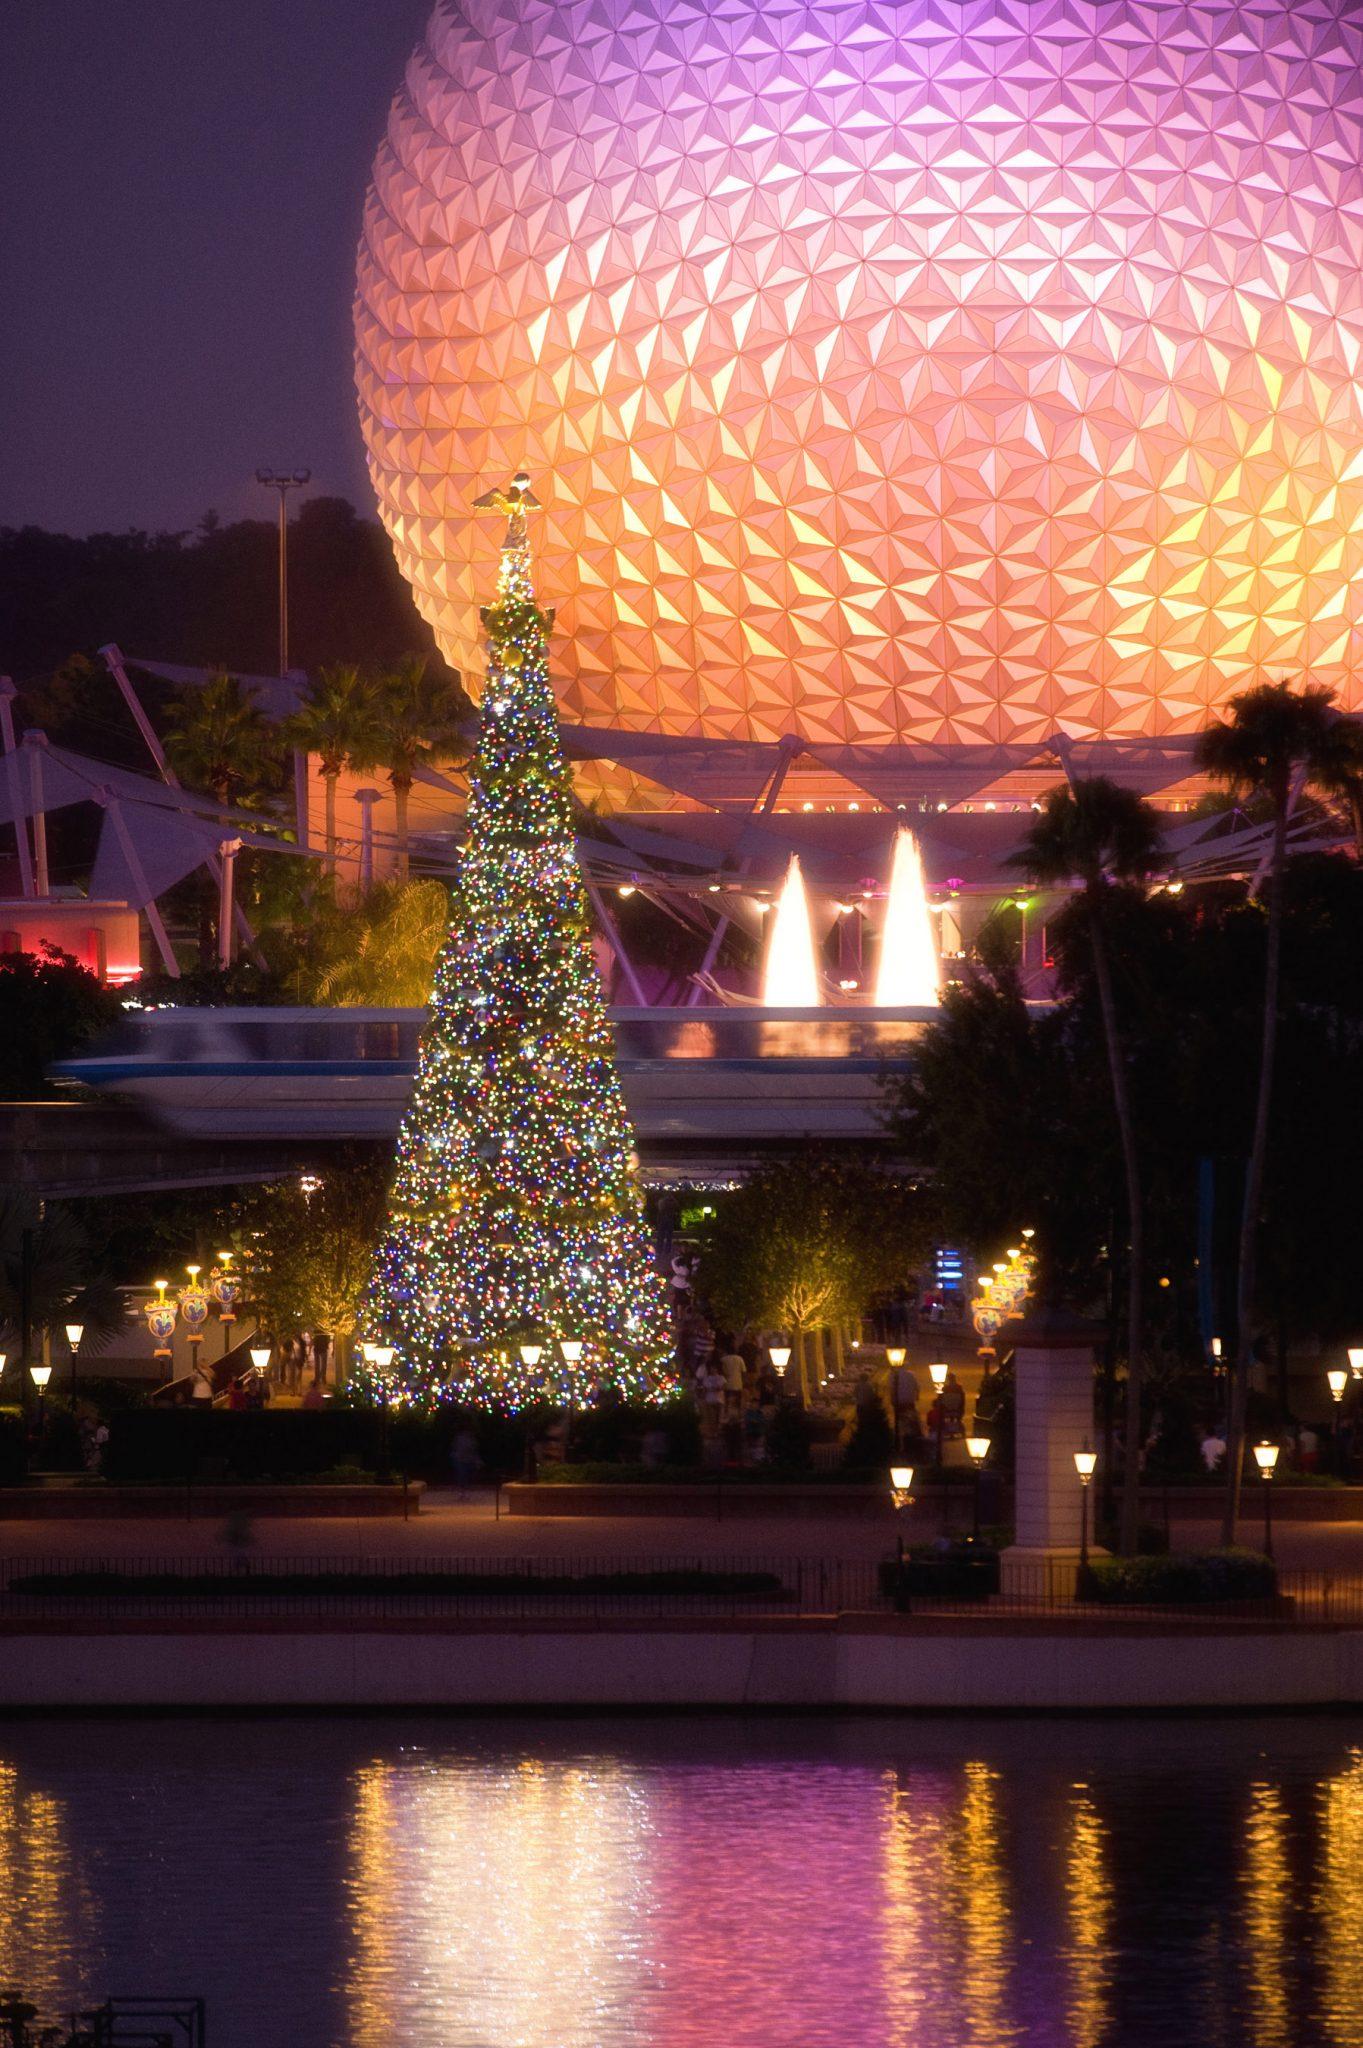 ResortLoop.com Episode 493 – Christmas At EPCOT